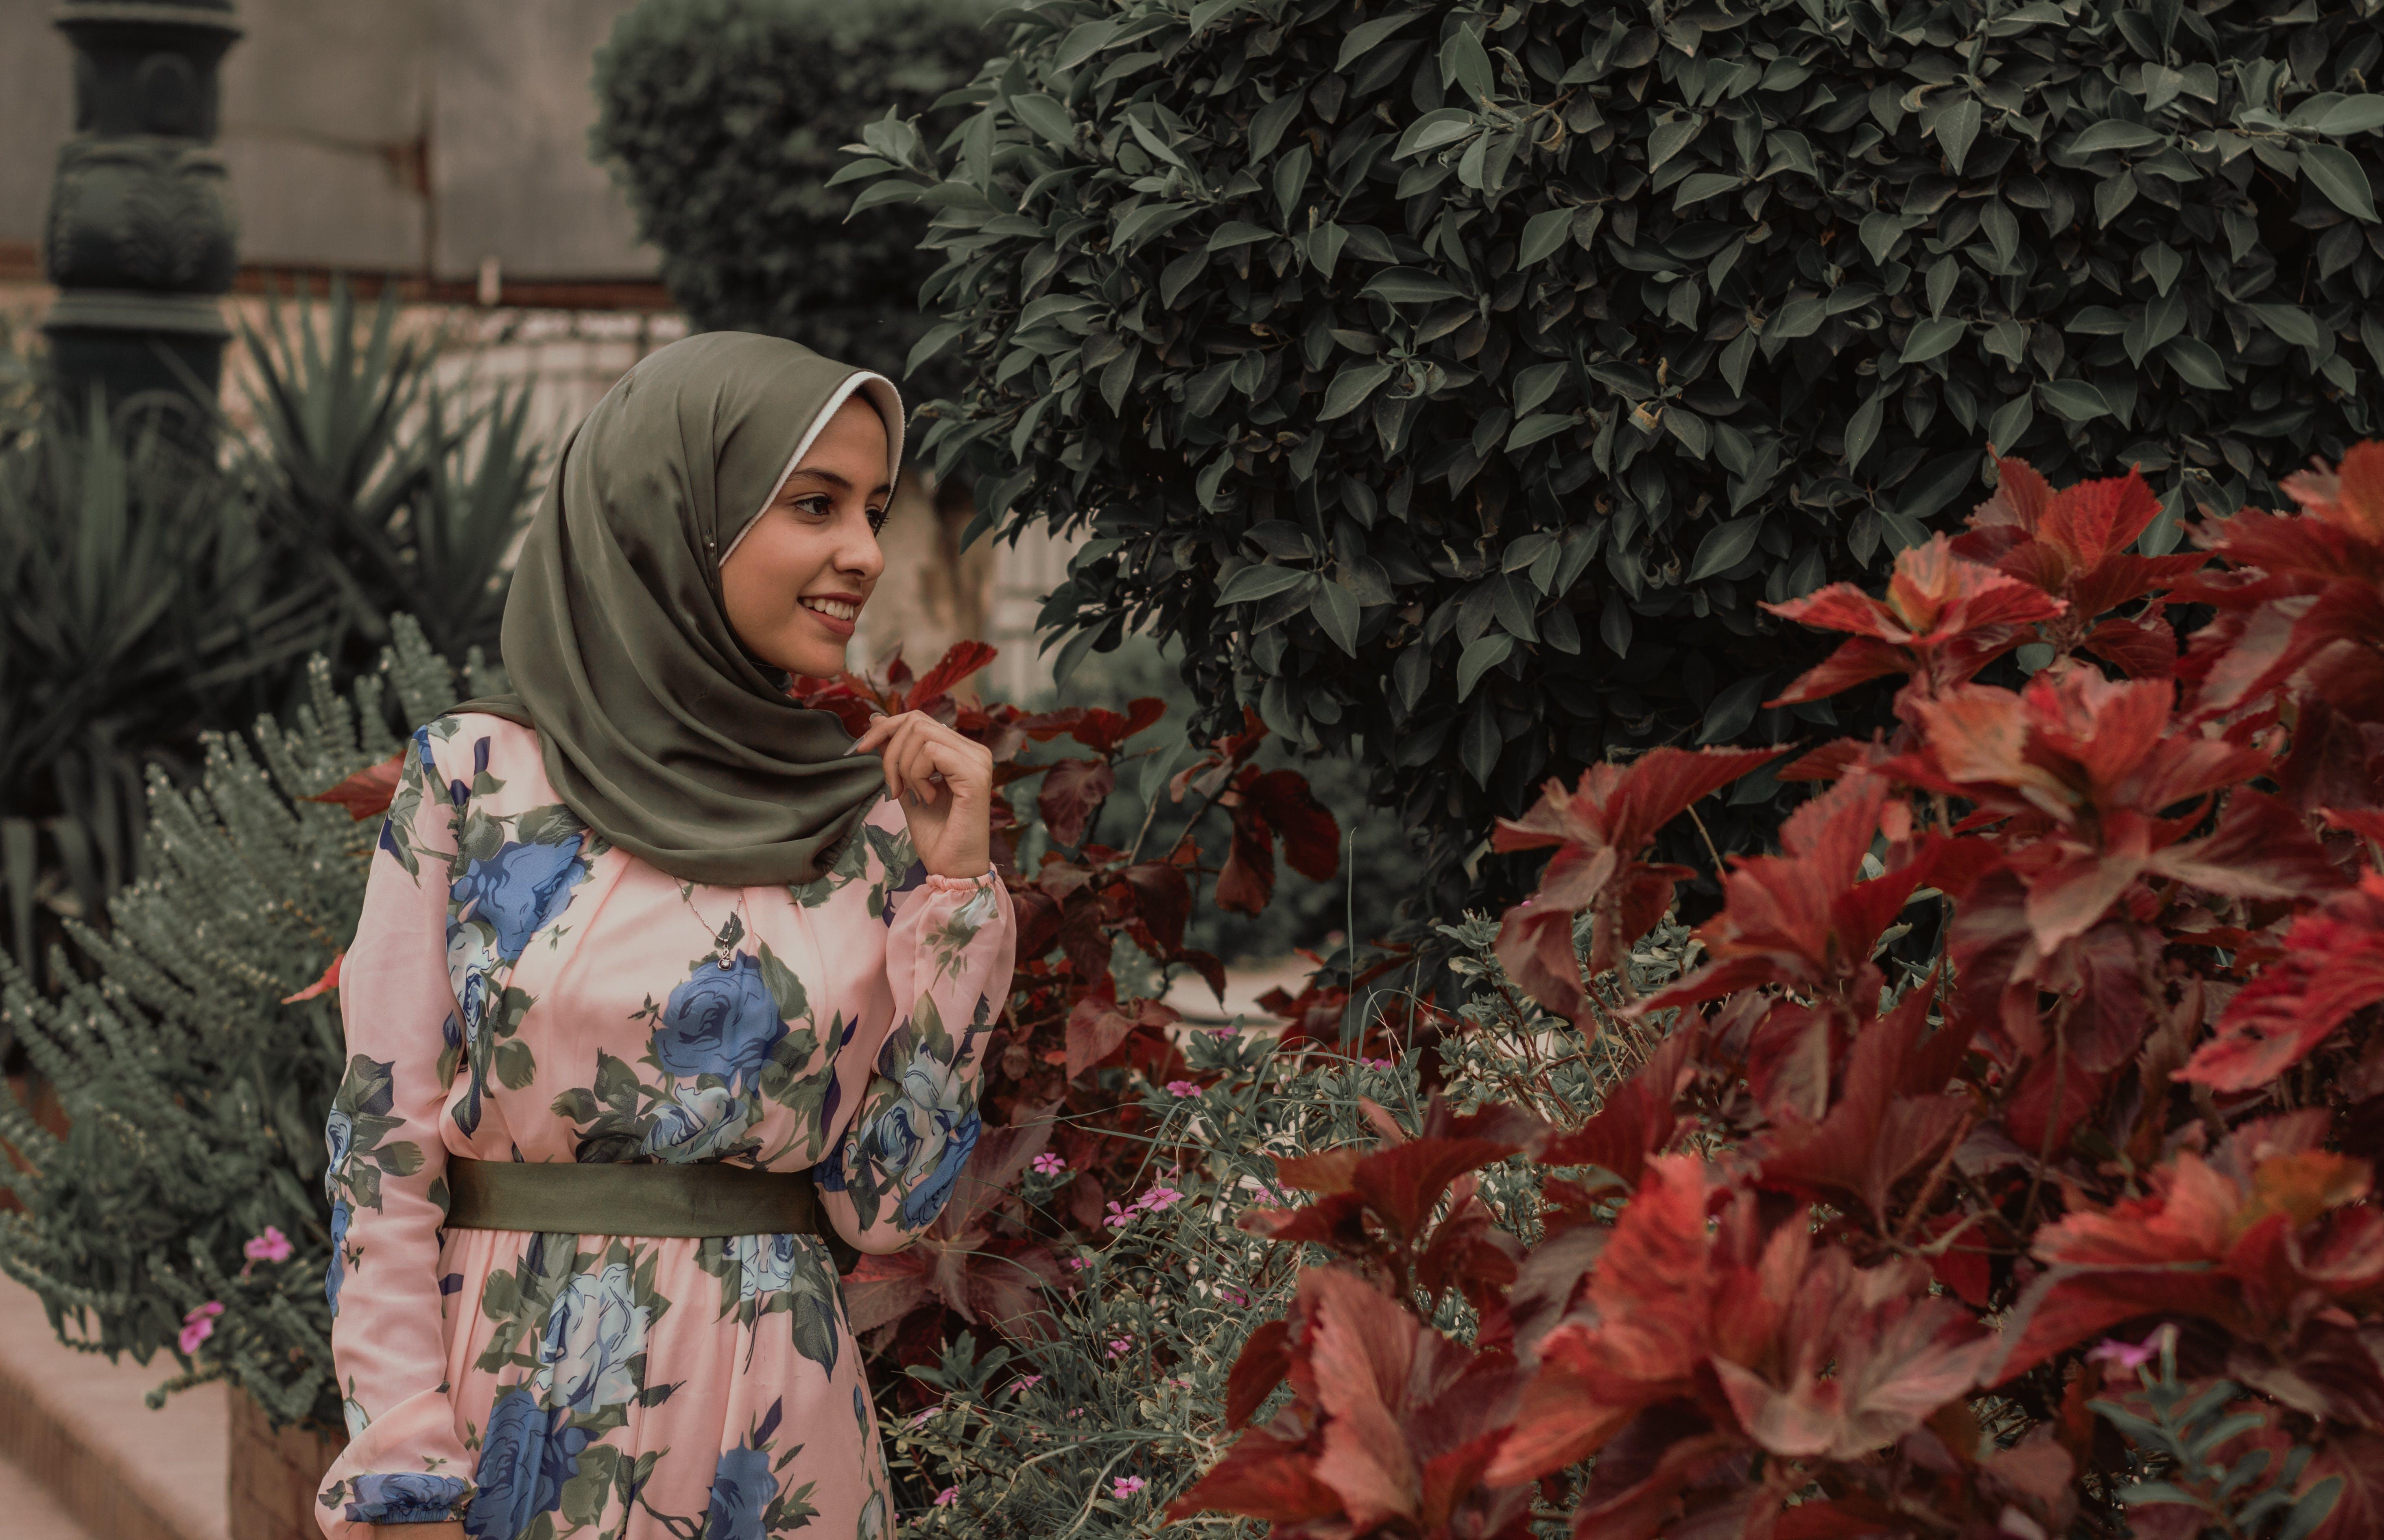 Woman Beside Red Petal Flowers